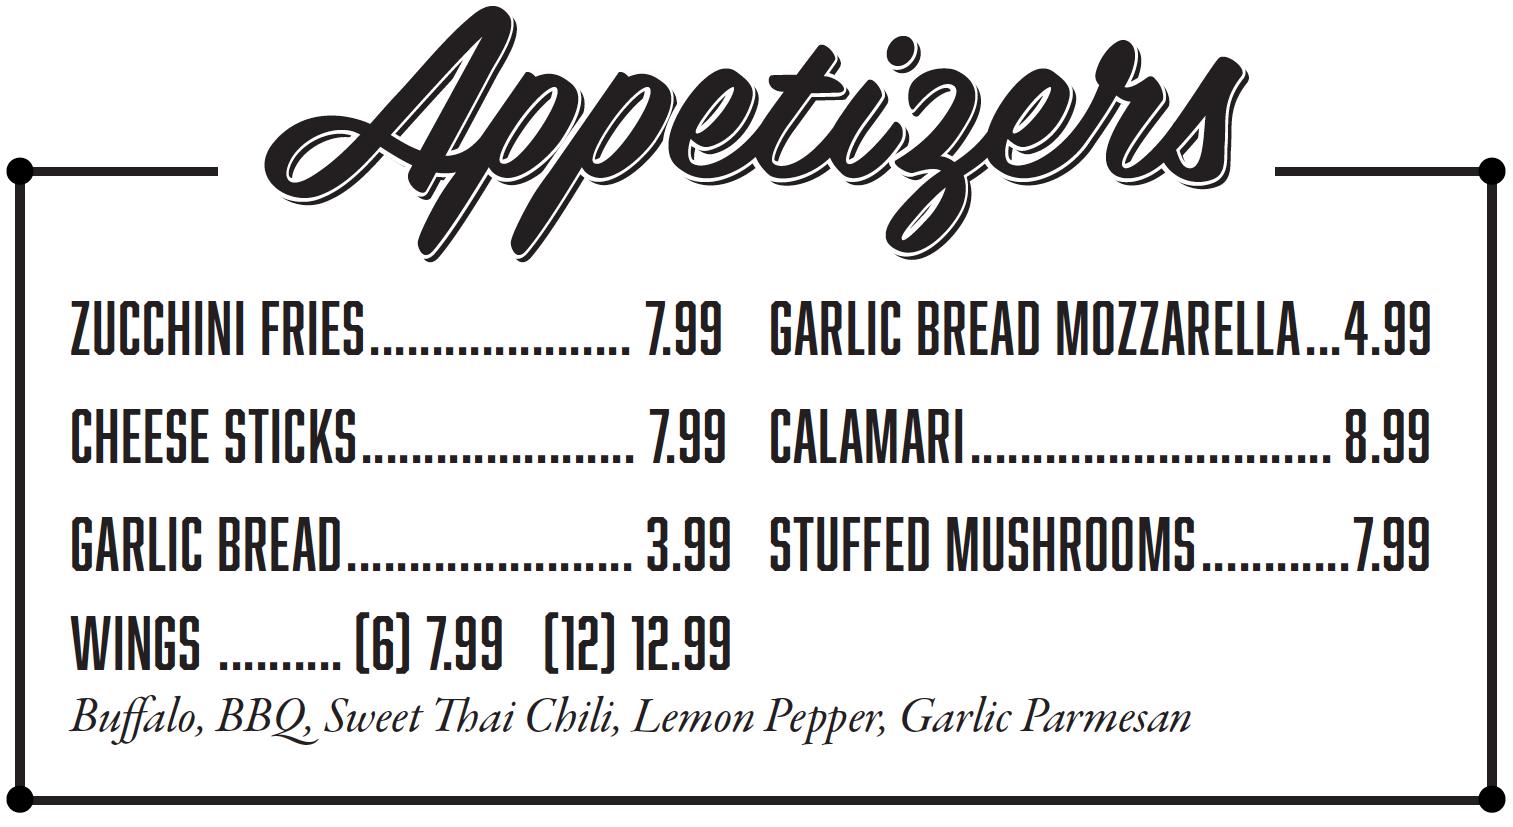 Salis Italian Restaurant Mckinney TX - Appetizers Menu